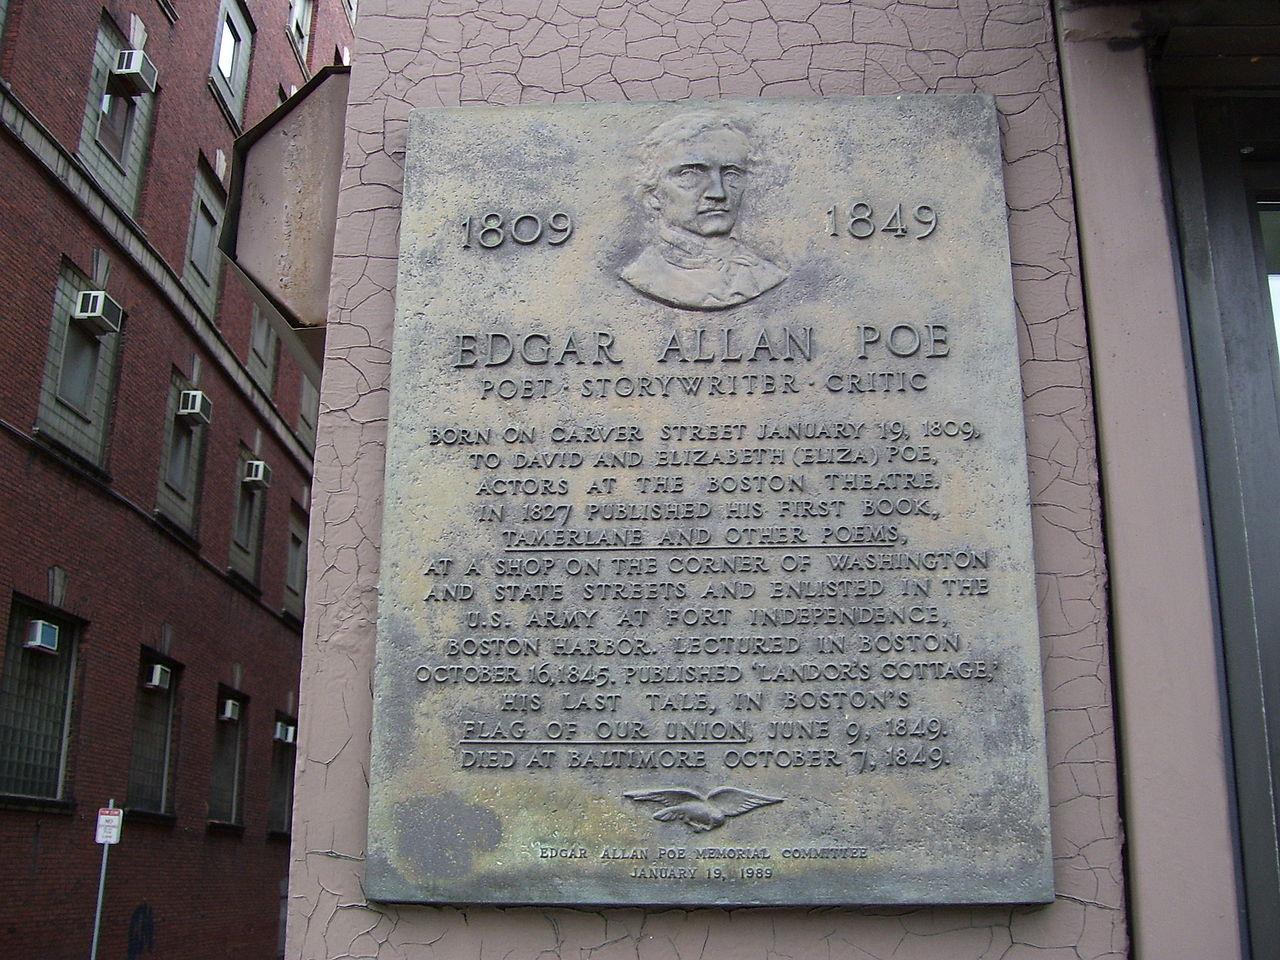 Edgar Allan Poe - povestiri scurte fantastice